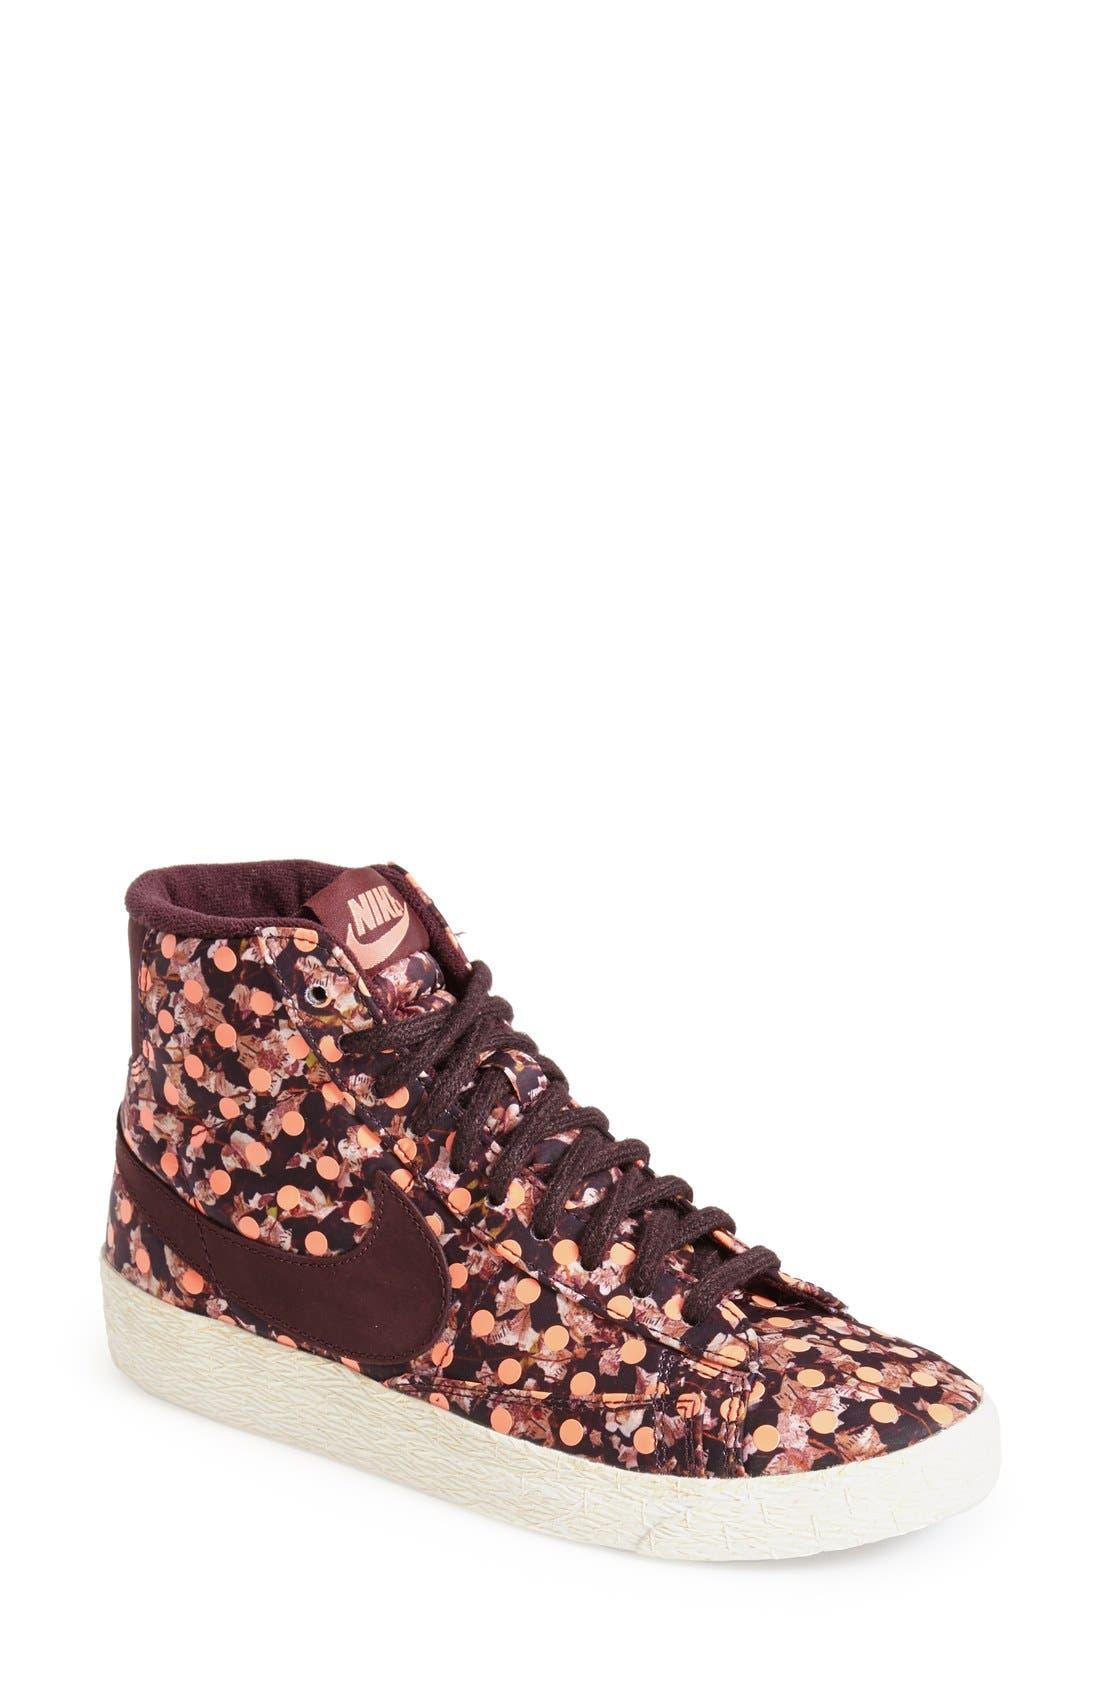 Alternate Image 1 Selected - Nike 'Mid Vintage Liberty' Sneaker (Women)